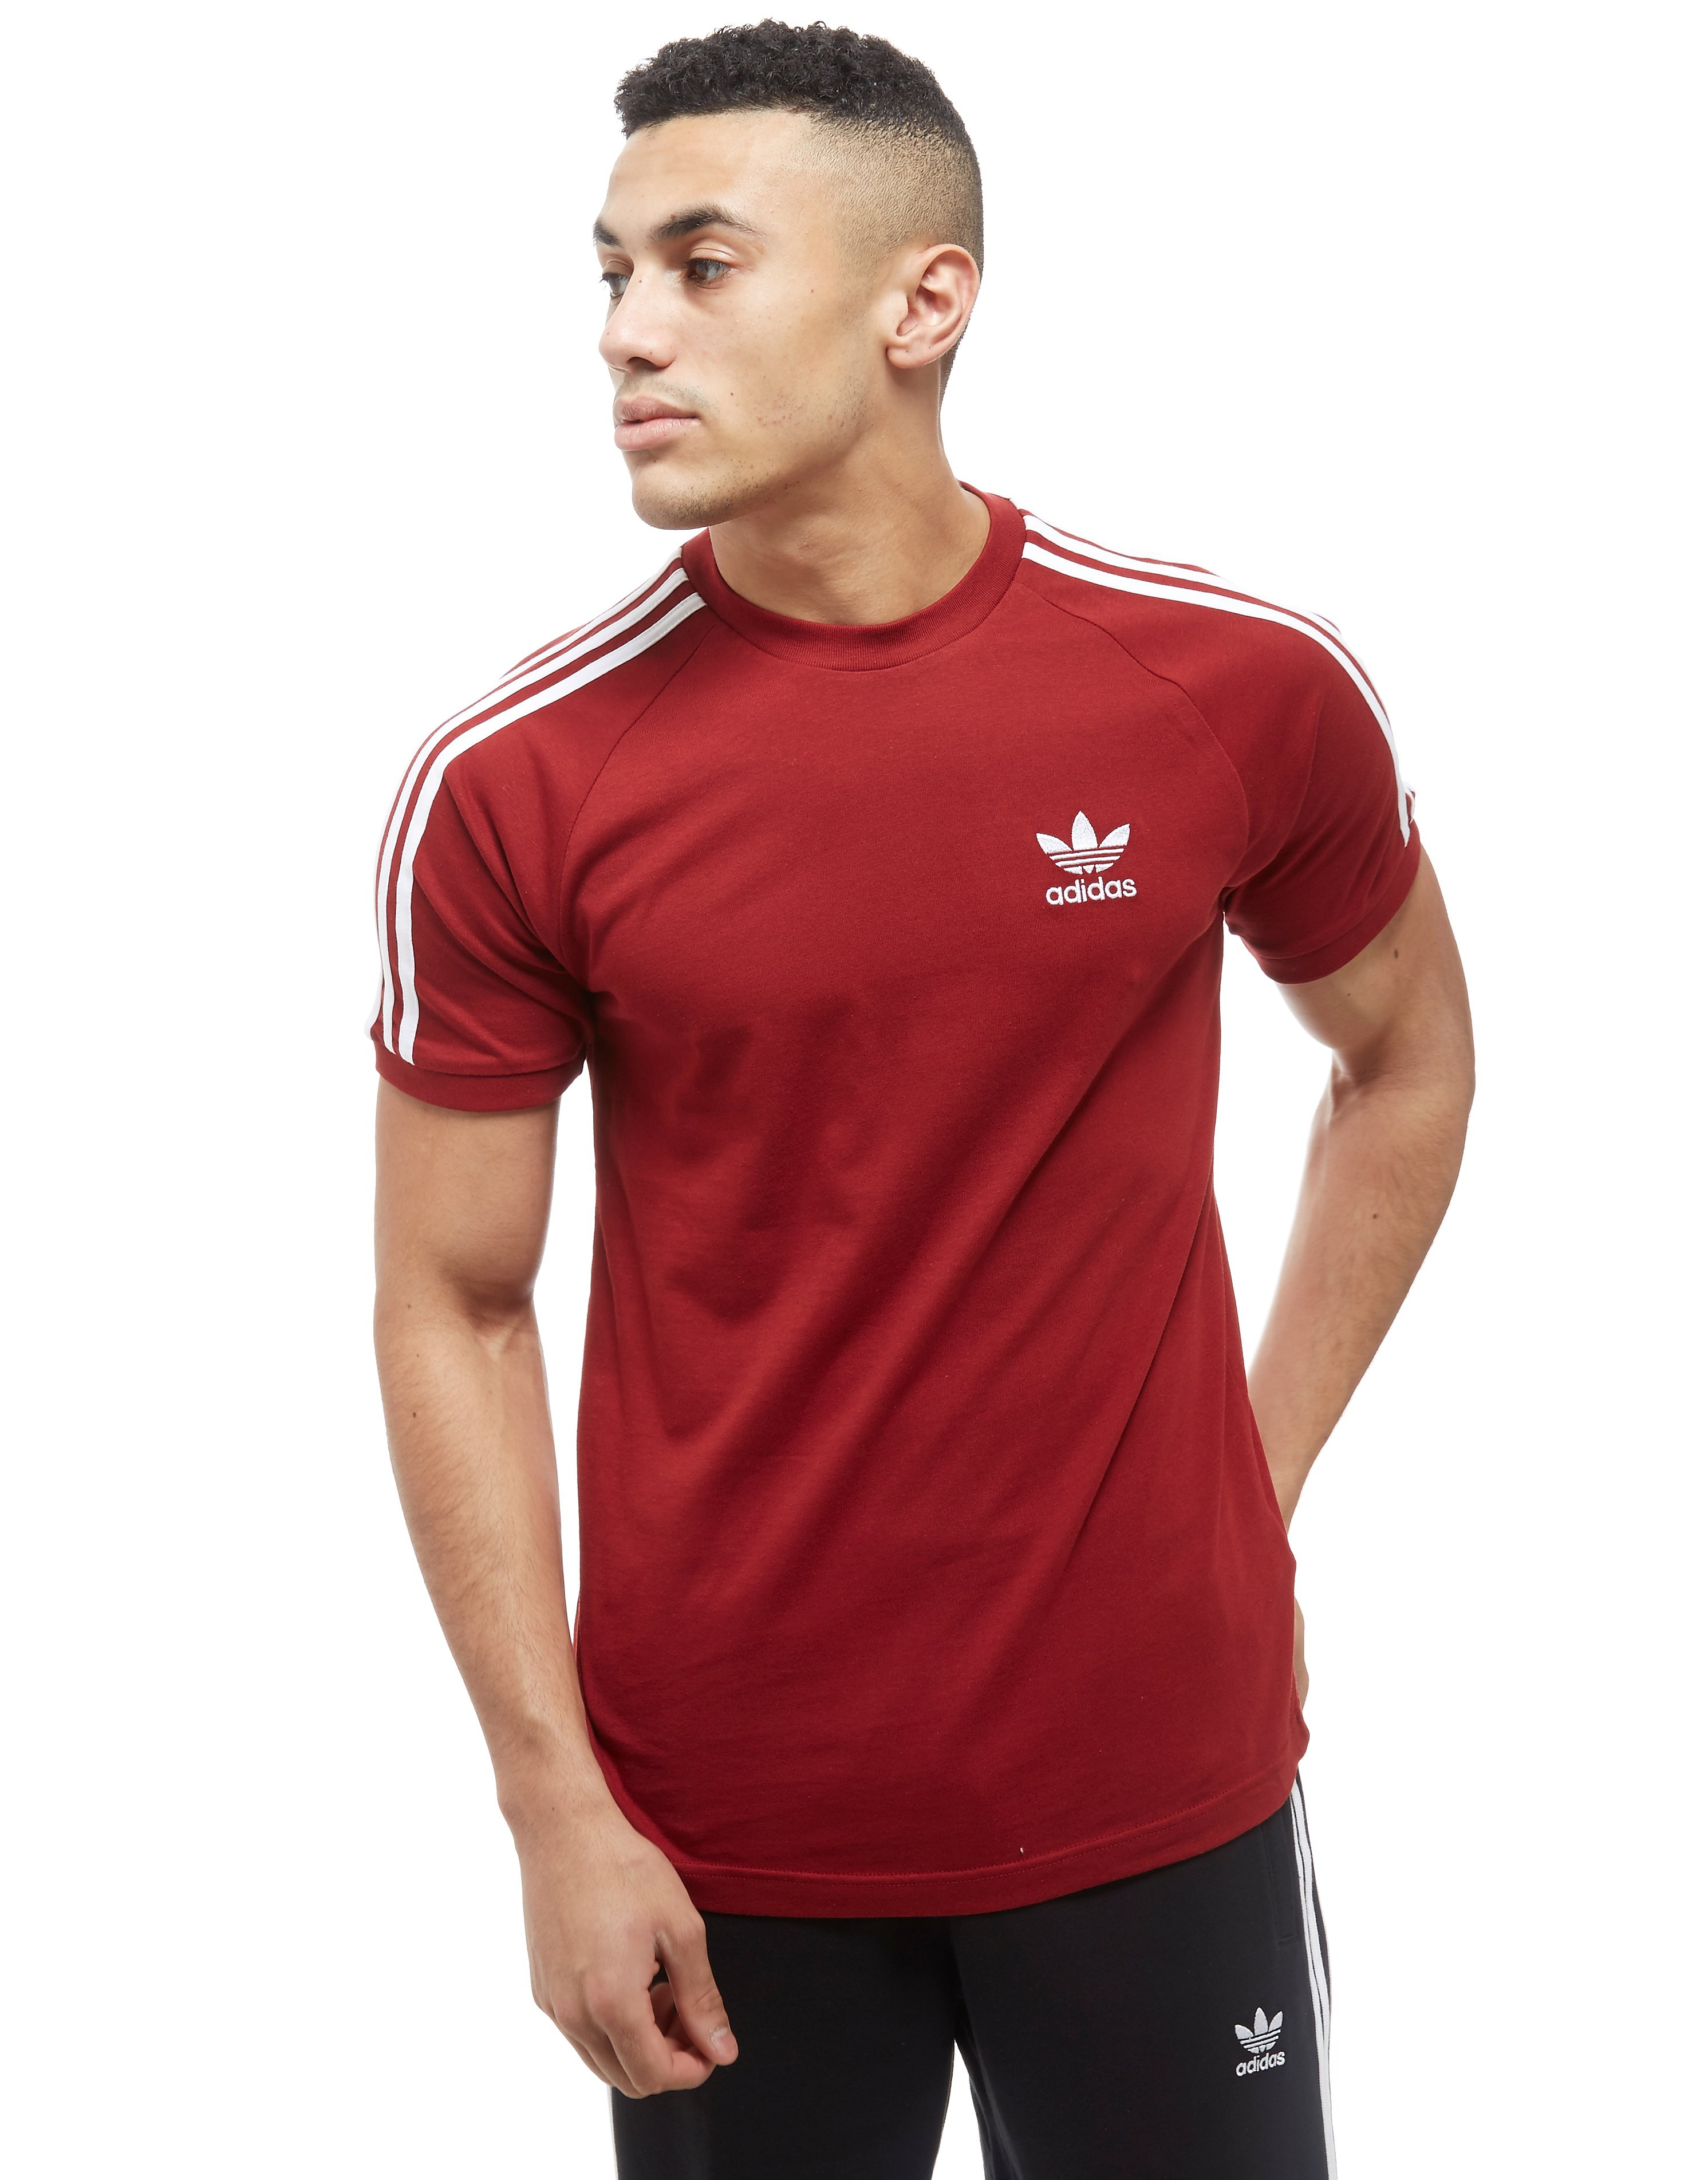 adidas Originals T-shirt California Homme